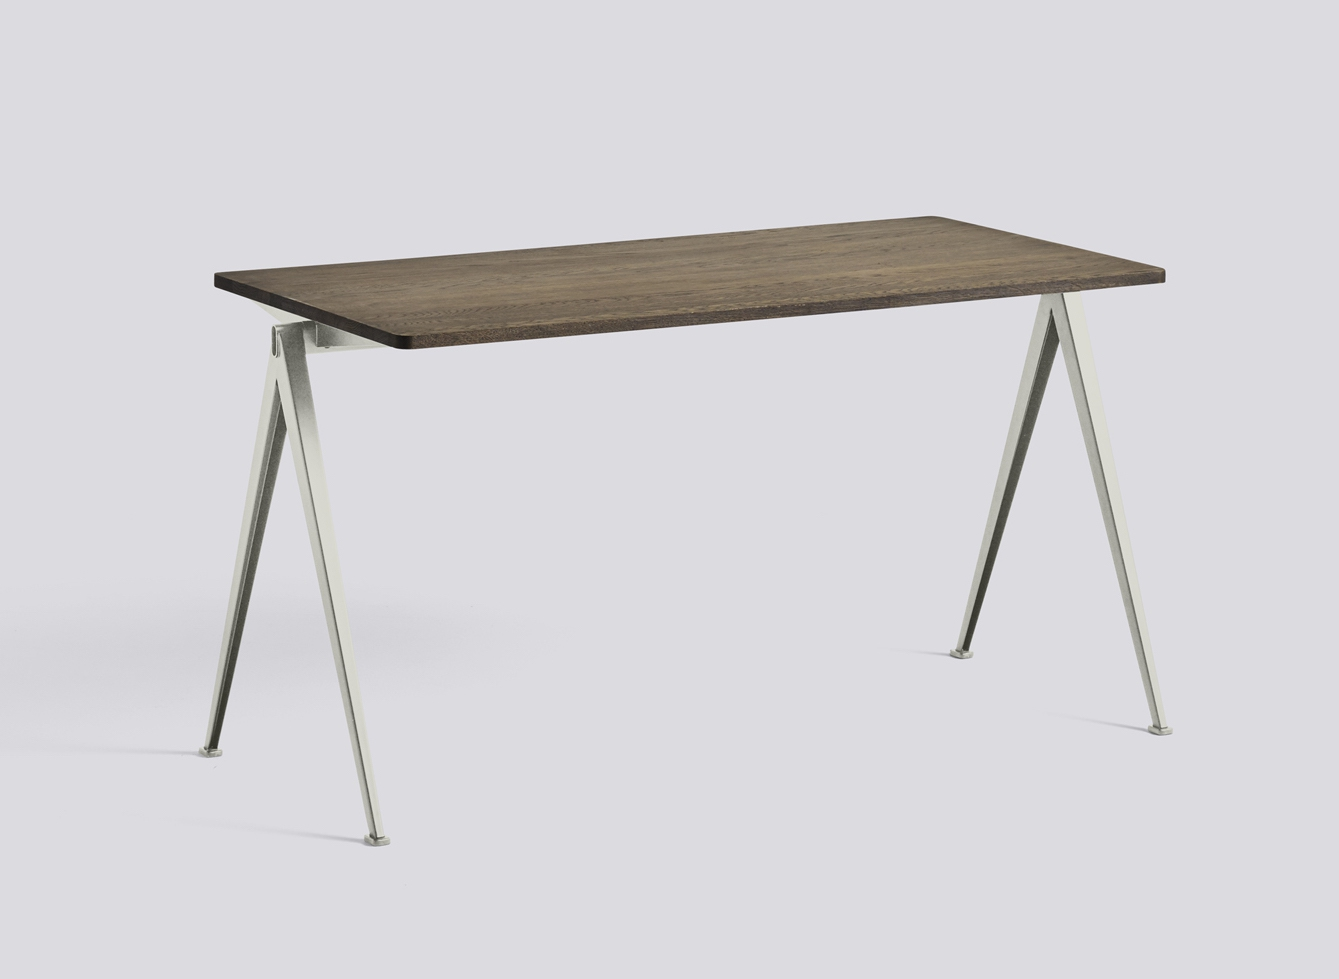 HAY Tisch Pyramid Table 01 beige - smoked oak